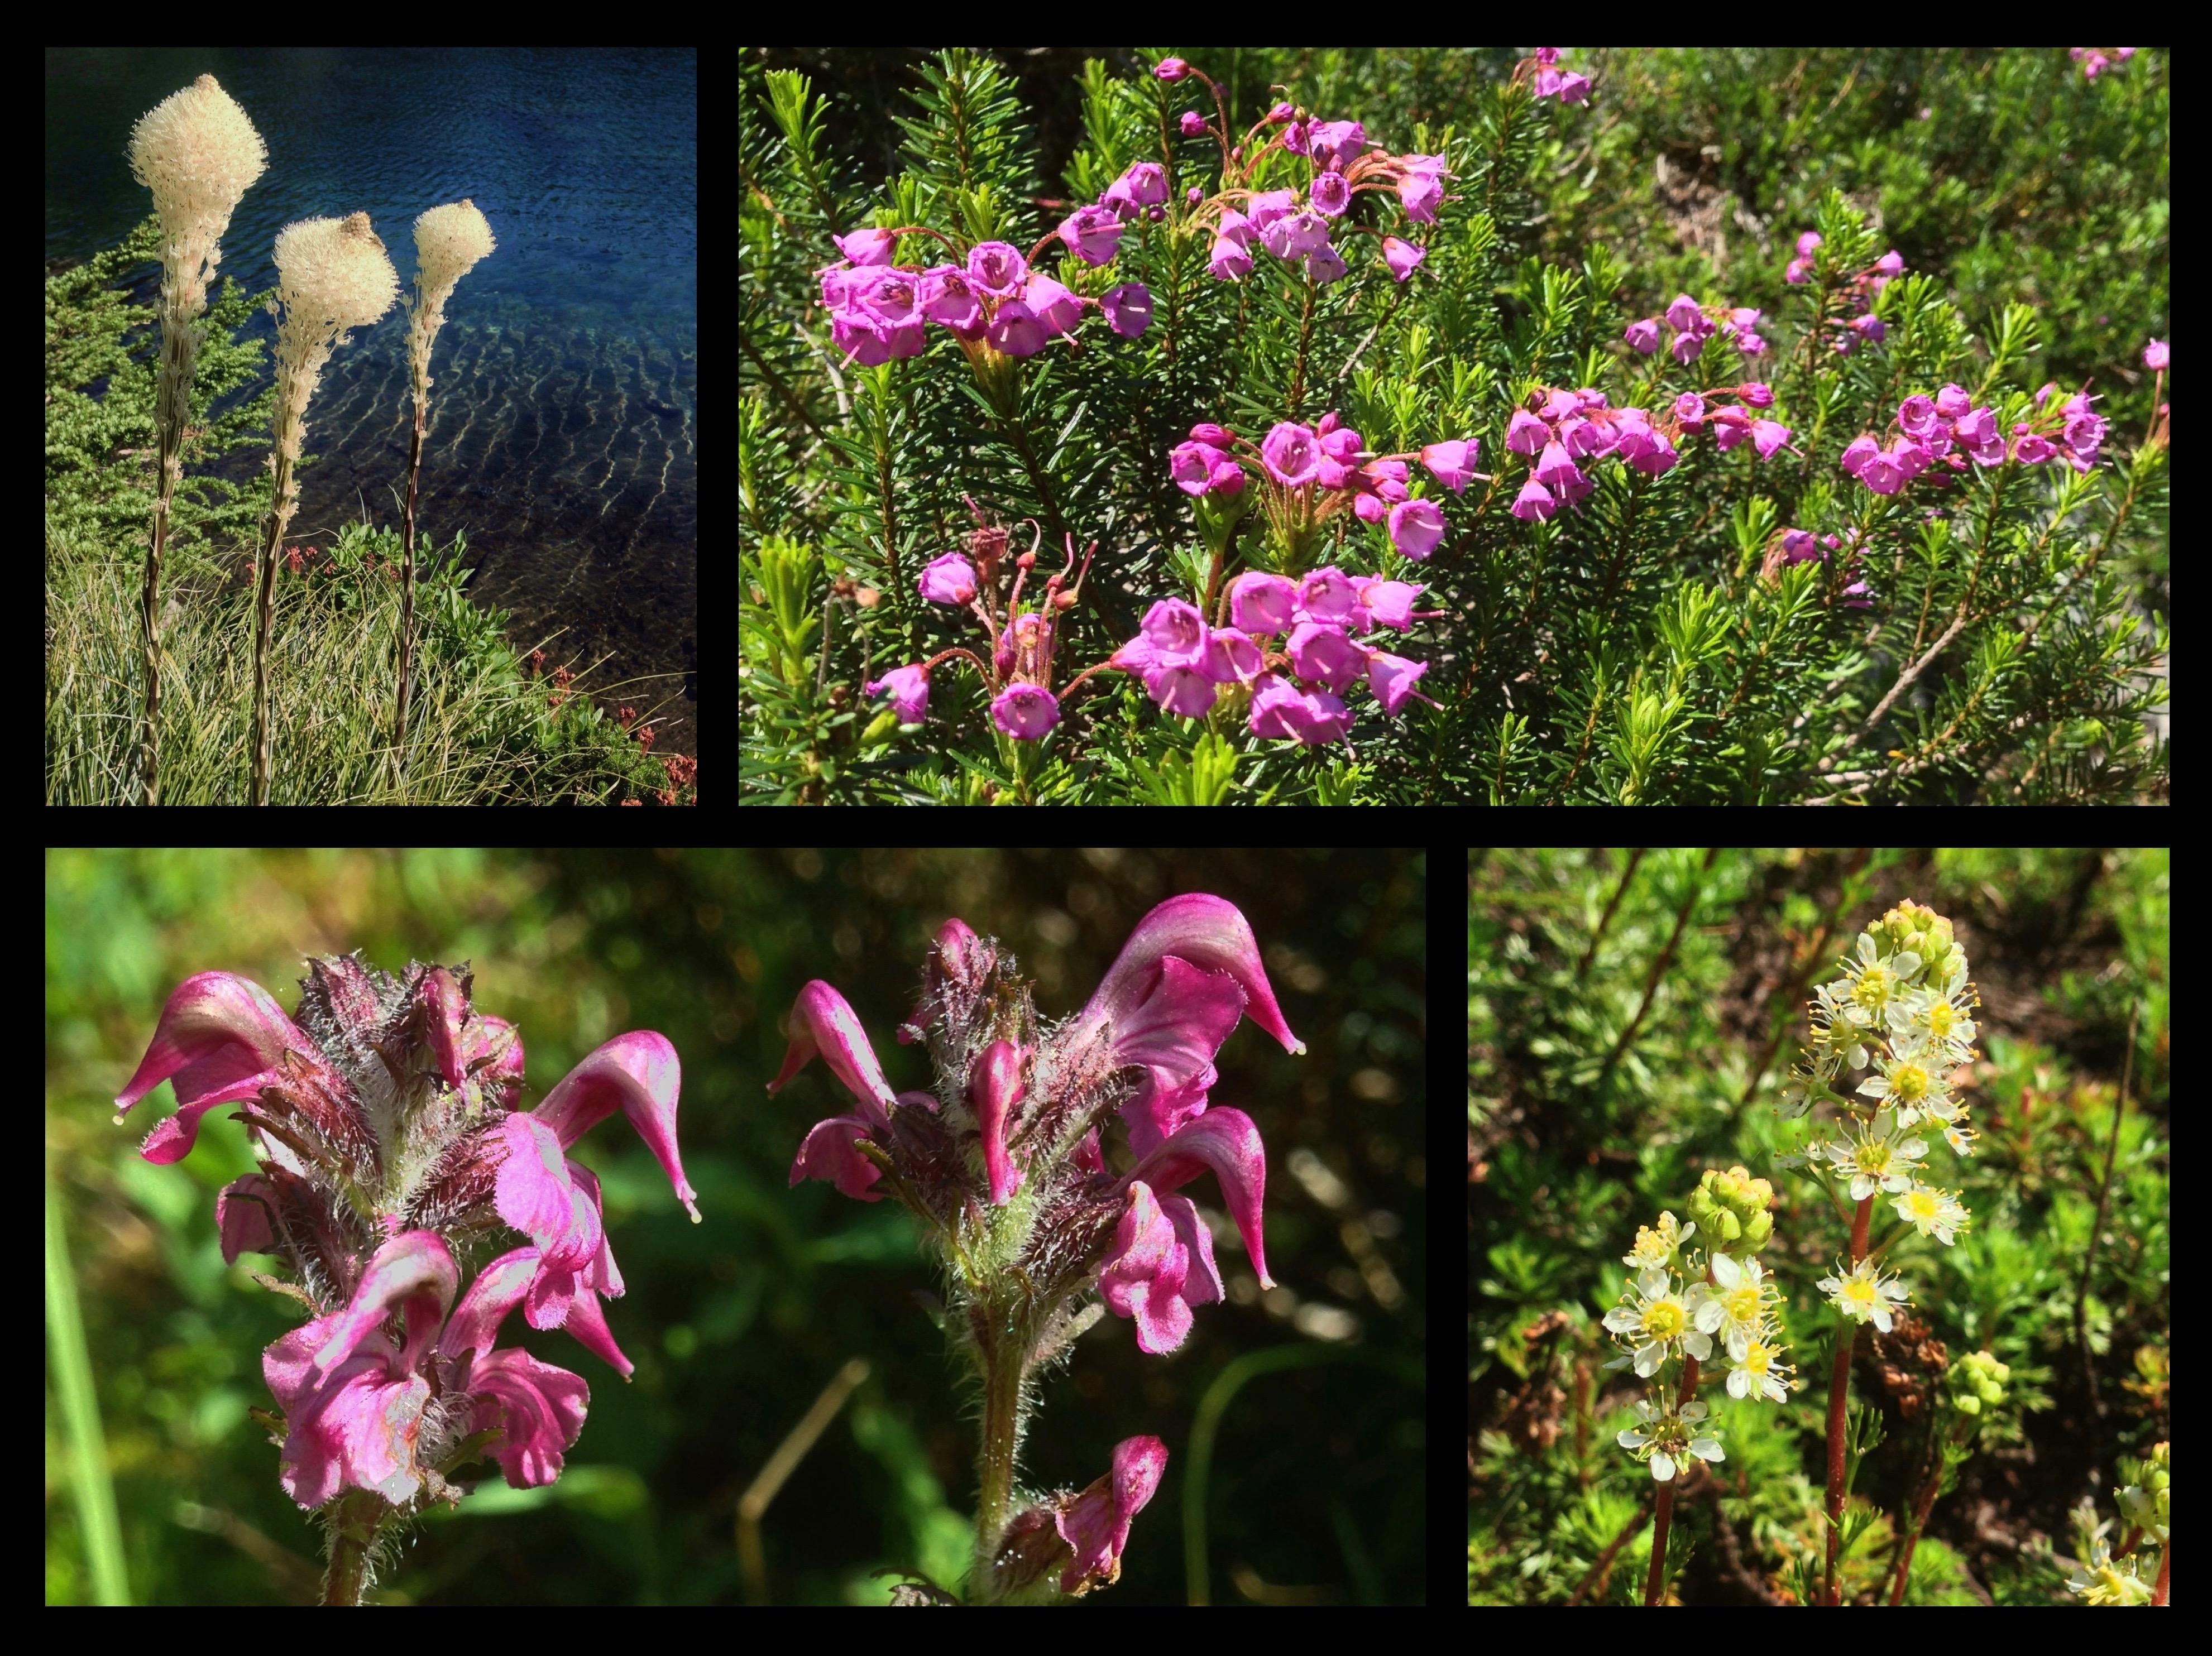 Other blooms bordering the lake include beargrass (Xerophyllum tenax) (top left), drifts of pink mountain-heath (Phyllodoce empetriformis) (top right), bird's beak lousewort (Pedicularis ornithorhyncha) (lower left), and partridgefoot (Luetkea pectinata) (lower right). Denny Creek - Melakwa Lake Trail, July 21, 2013 and August 03, 2014.